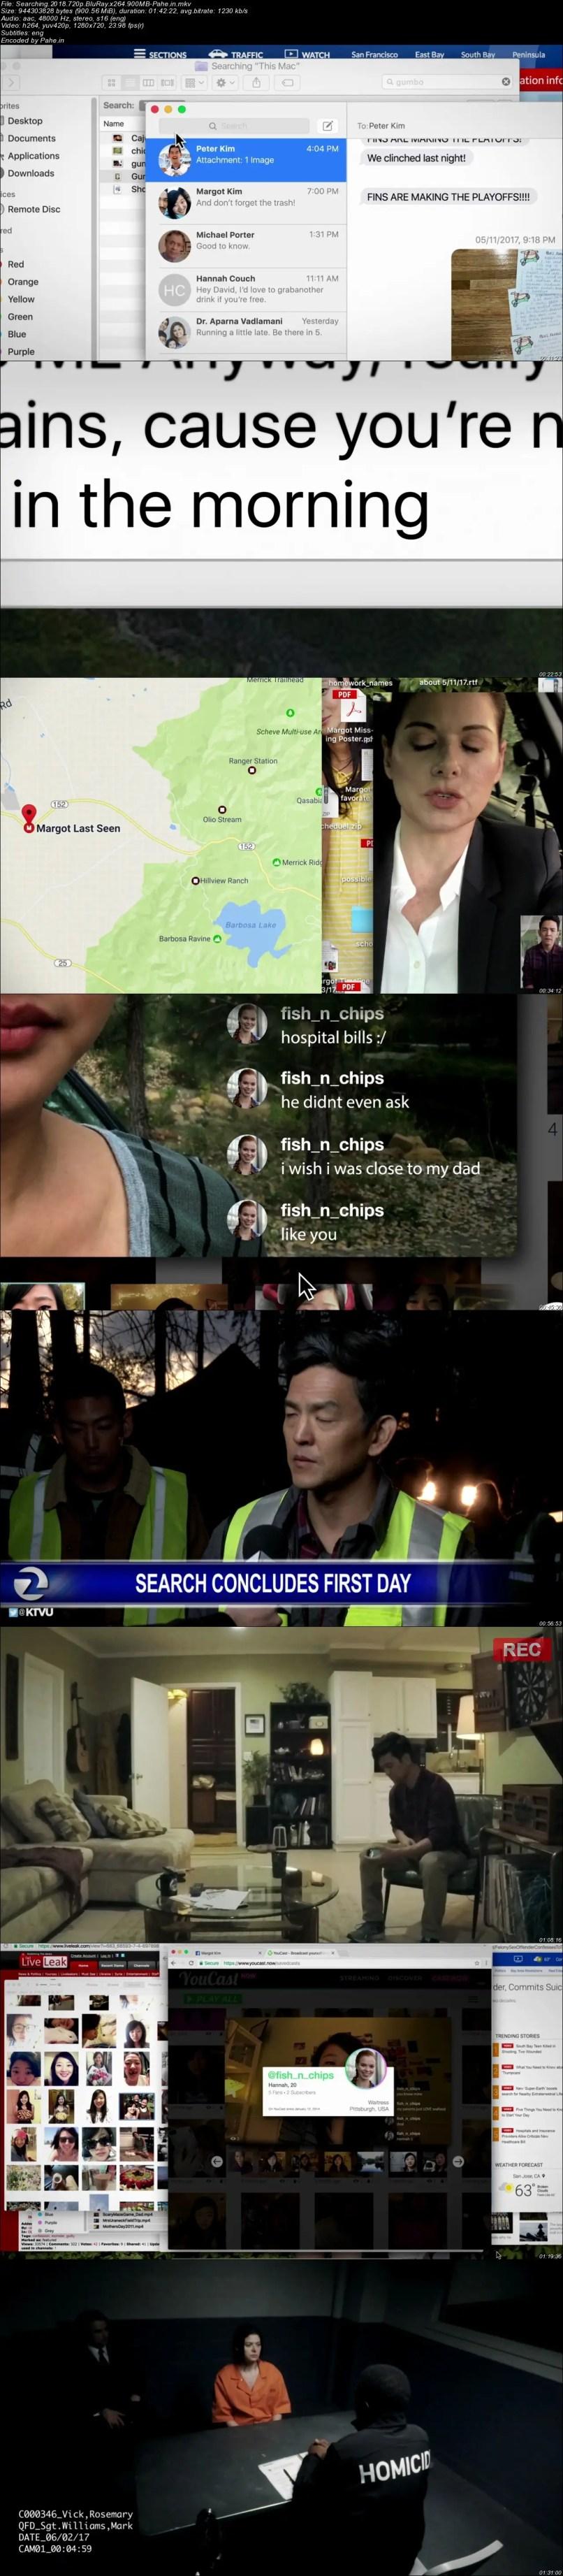 Game Of Thrones Subtitles Season 4 Shaanig | Wajigame co